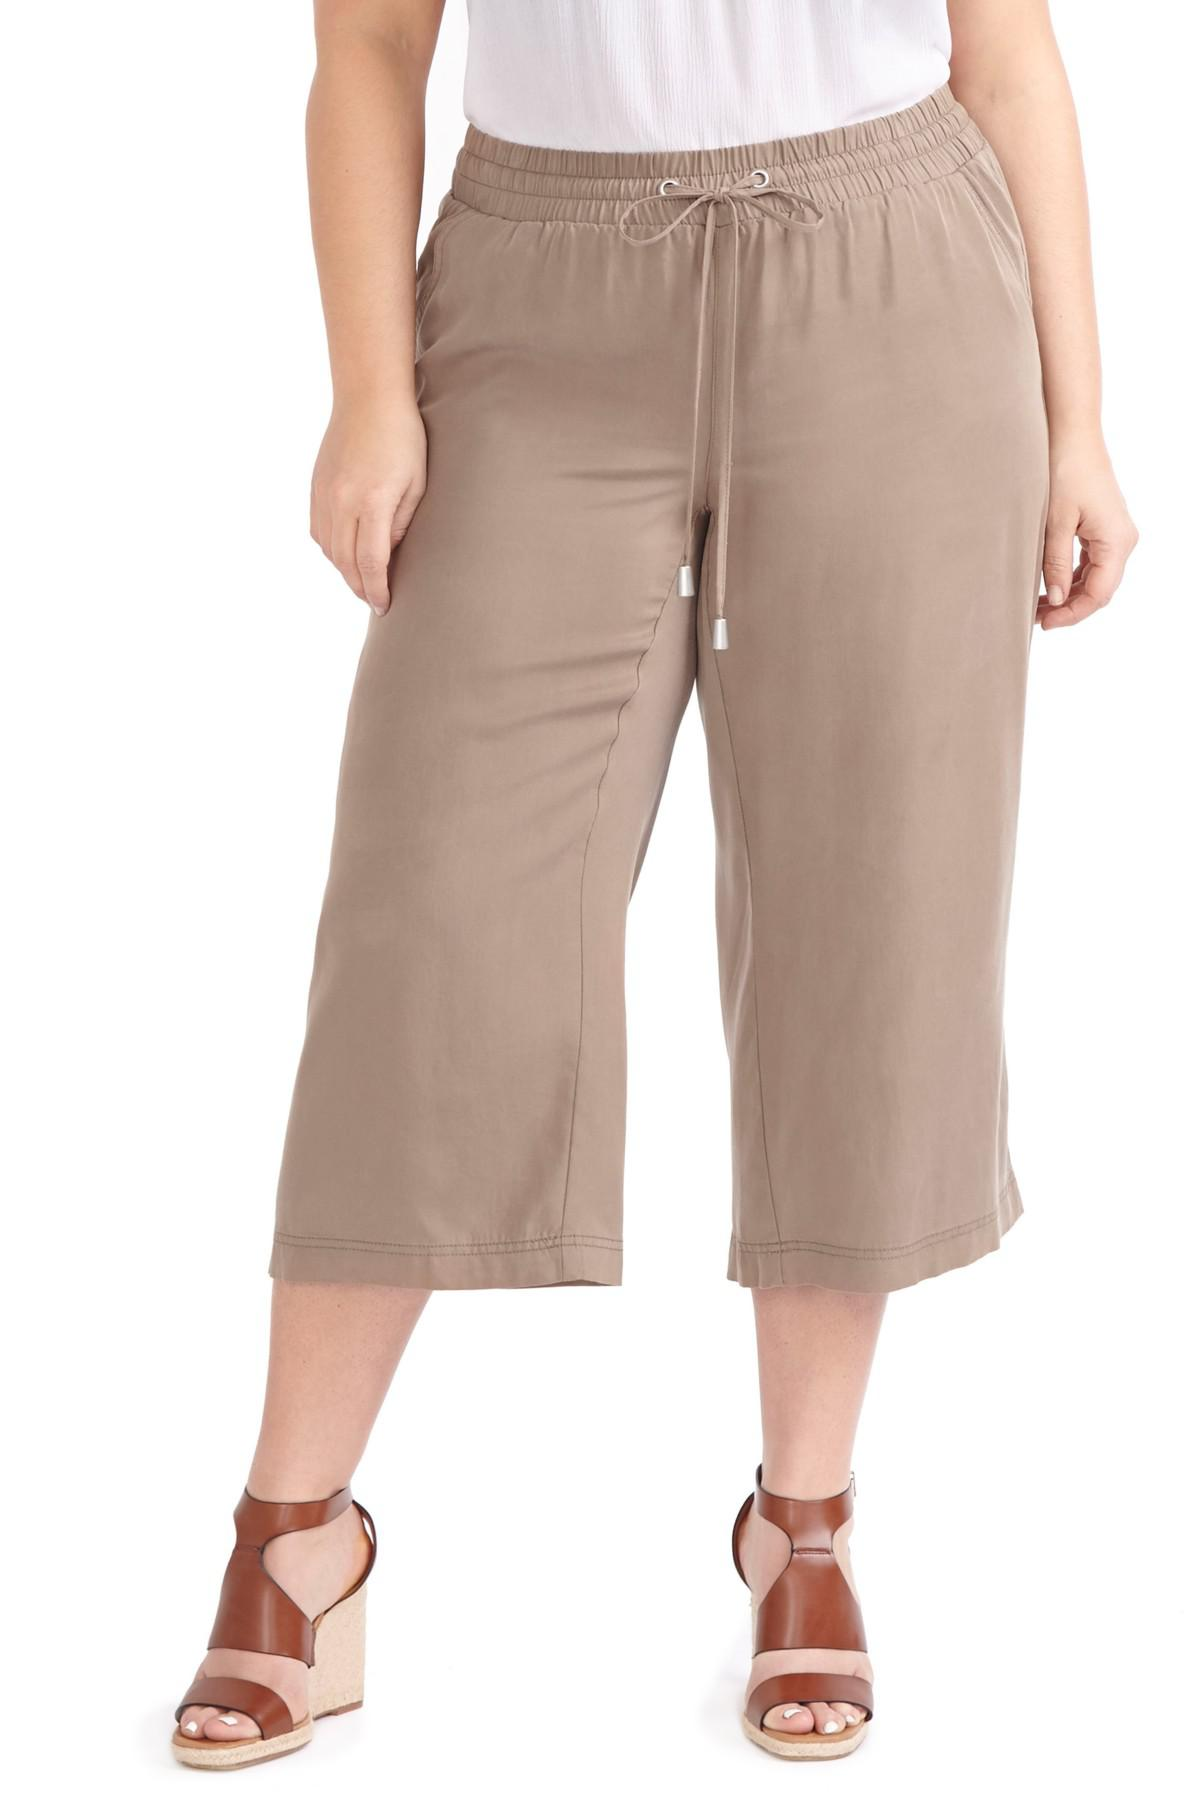 b76cffbee9d39 Lyst - Addition Elle Wide Leg Capri Pants (plus Size) in Brown